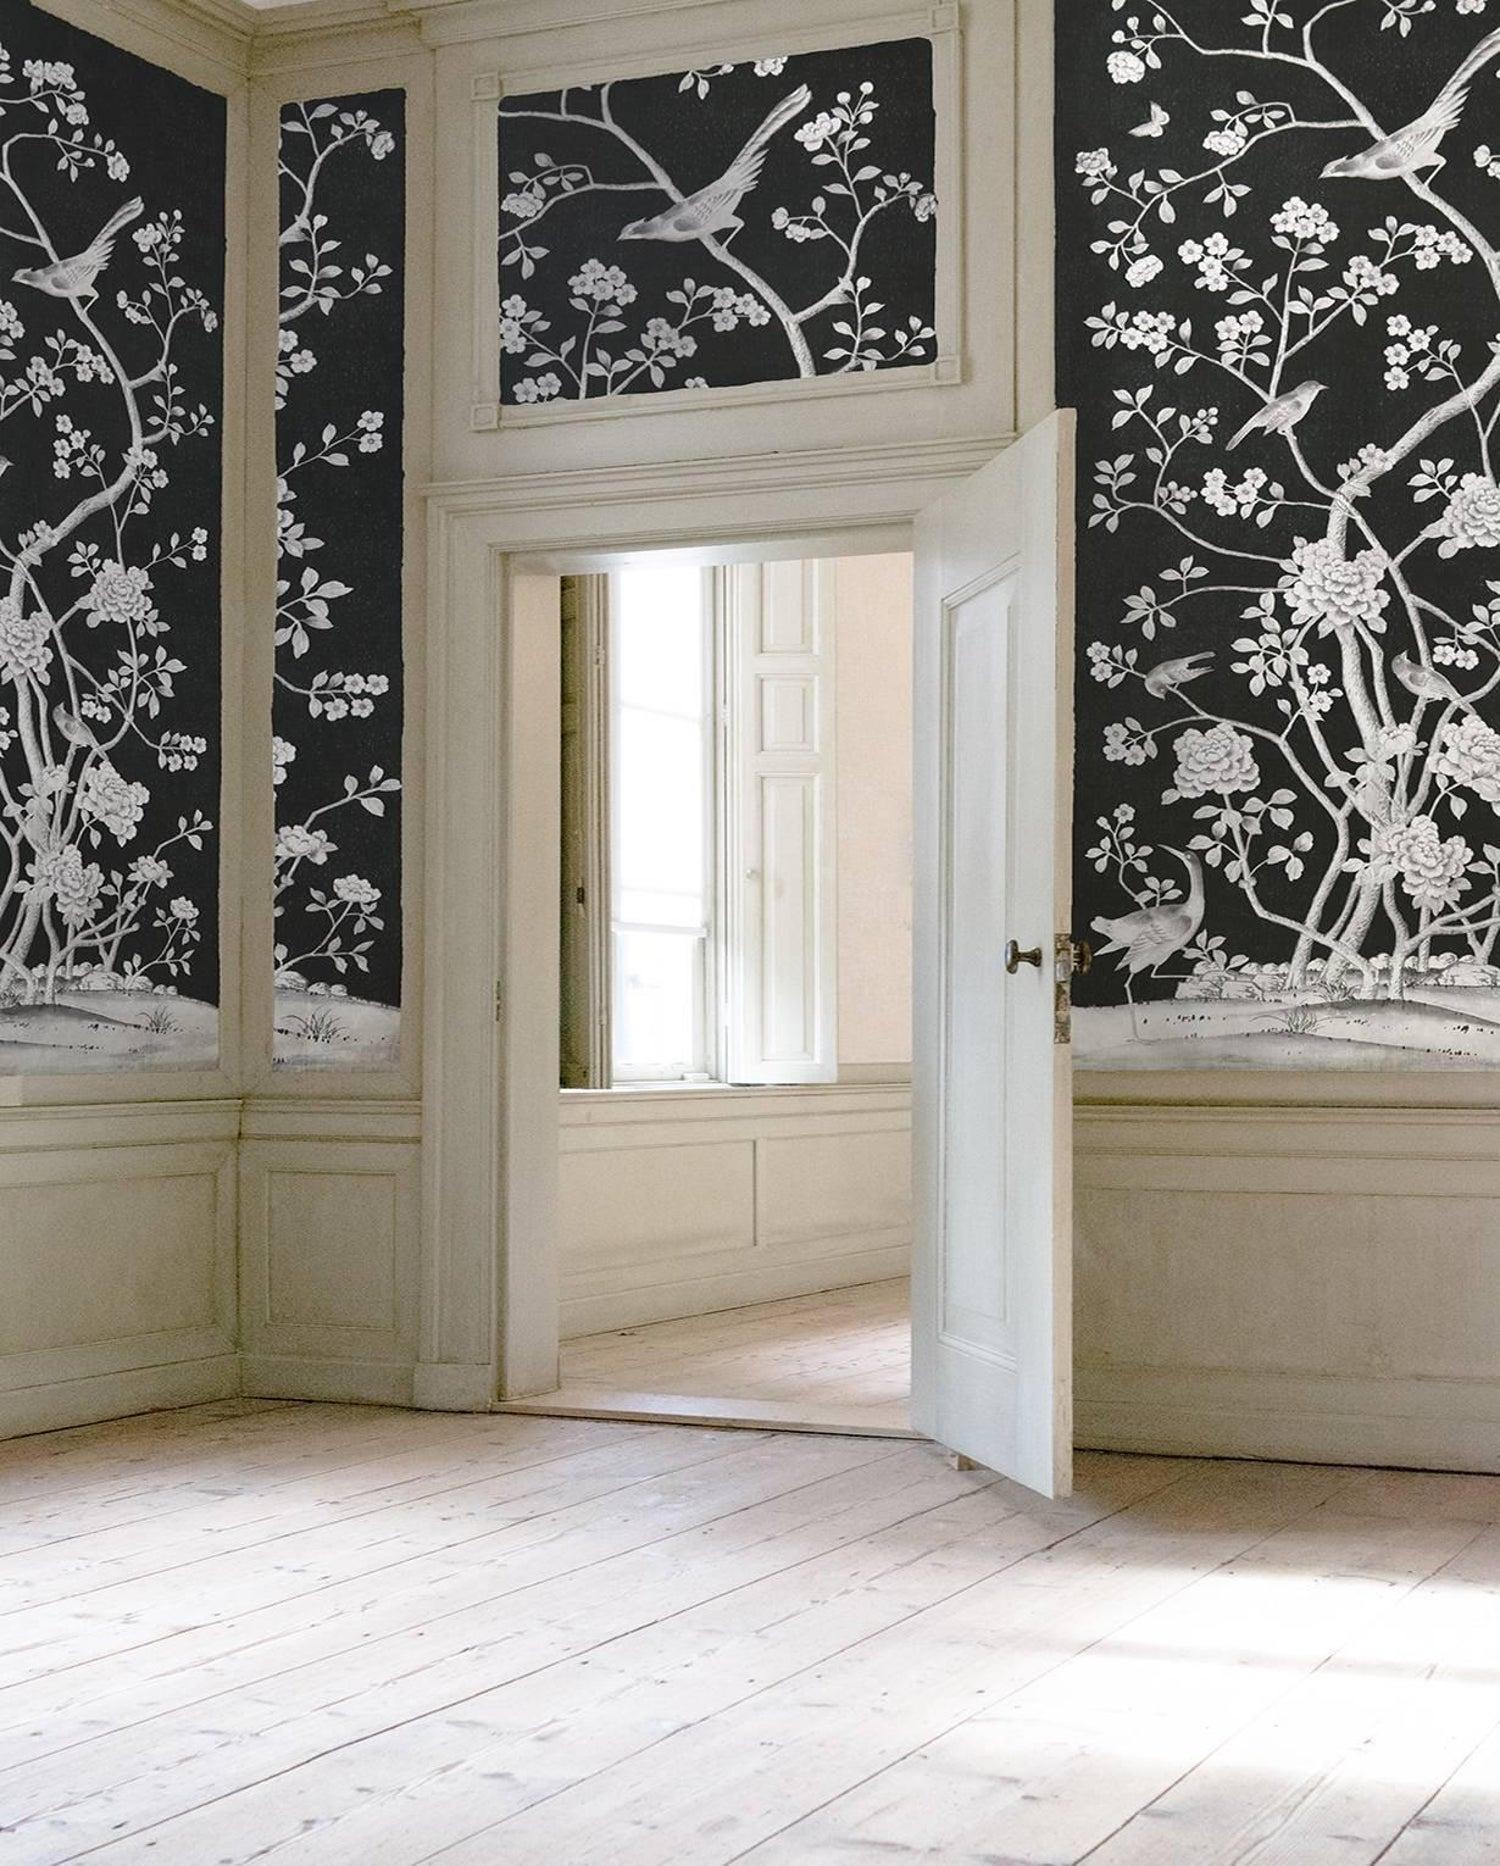 Schumacher Mary Mcdonald Chinois Palais Floral Lavender Wallpaper Panel